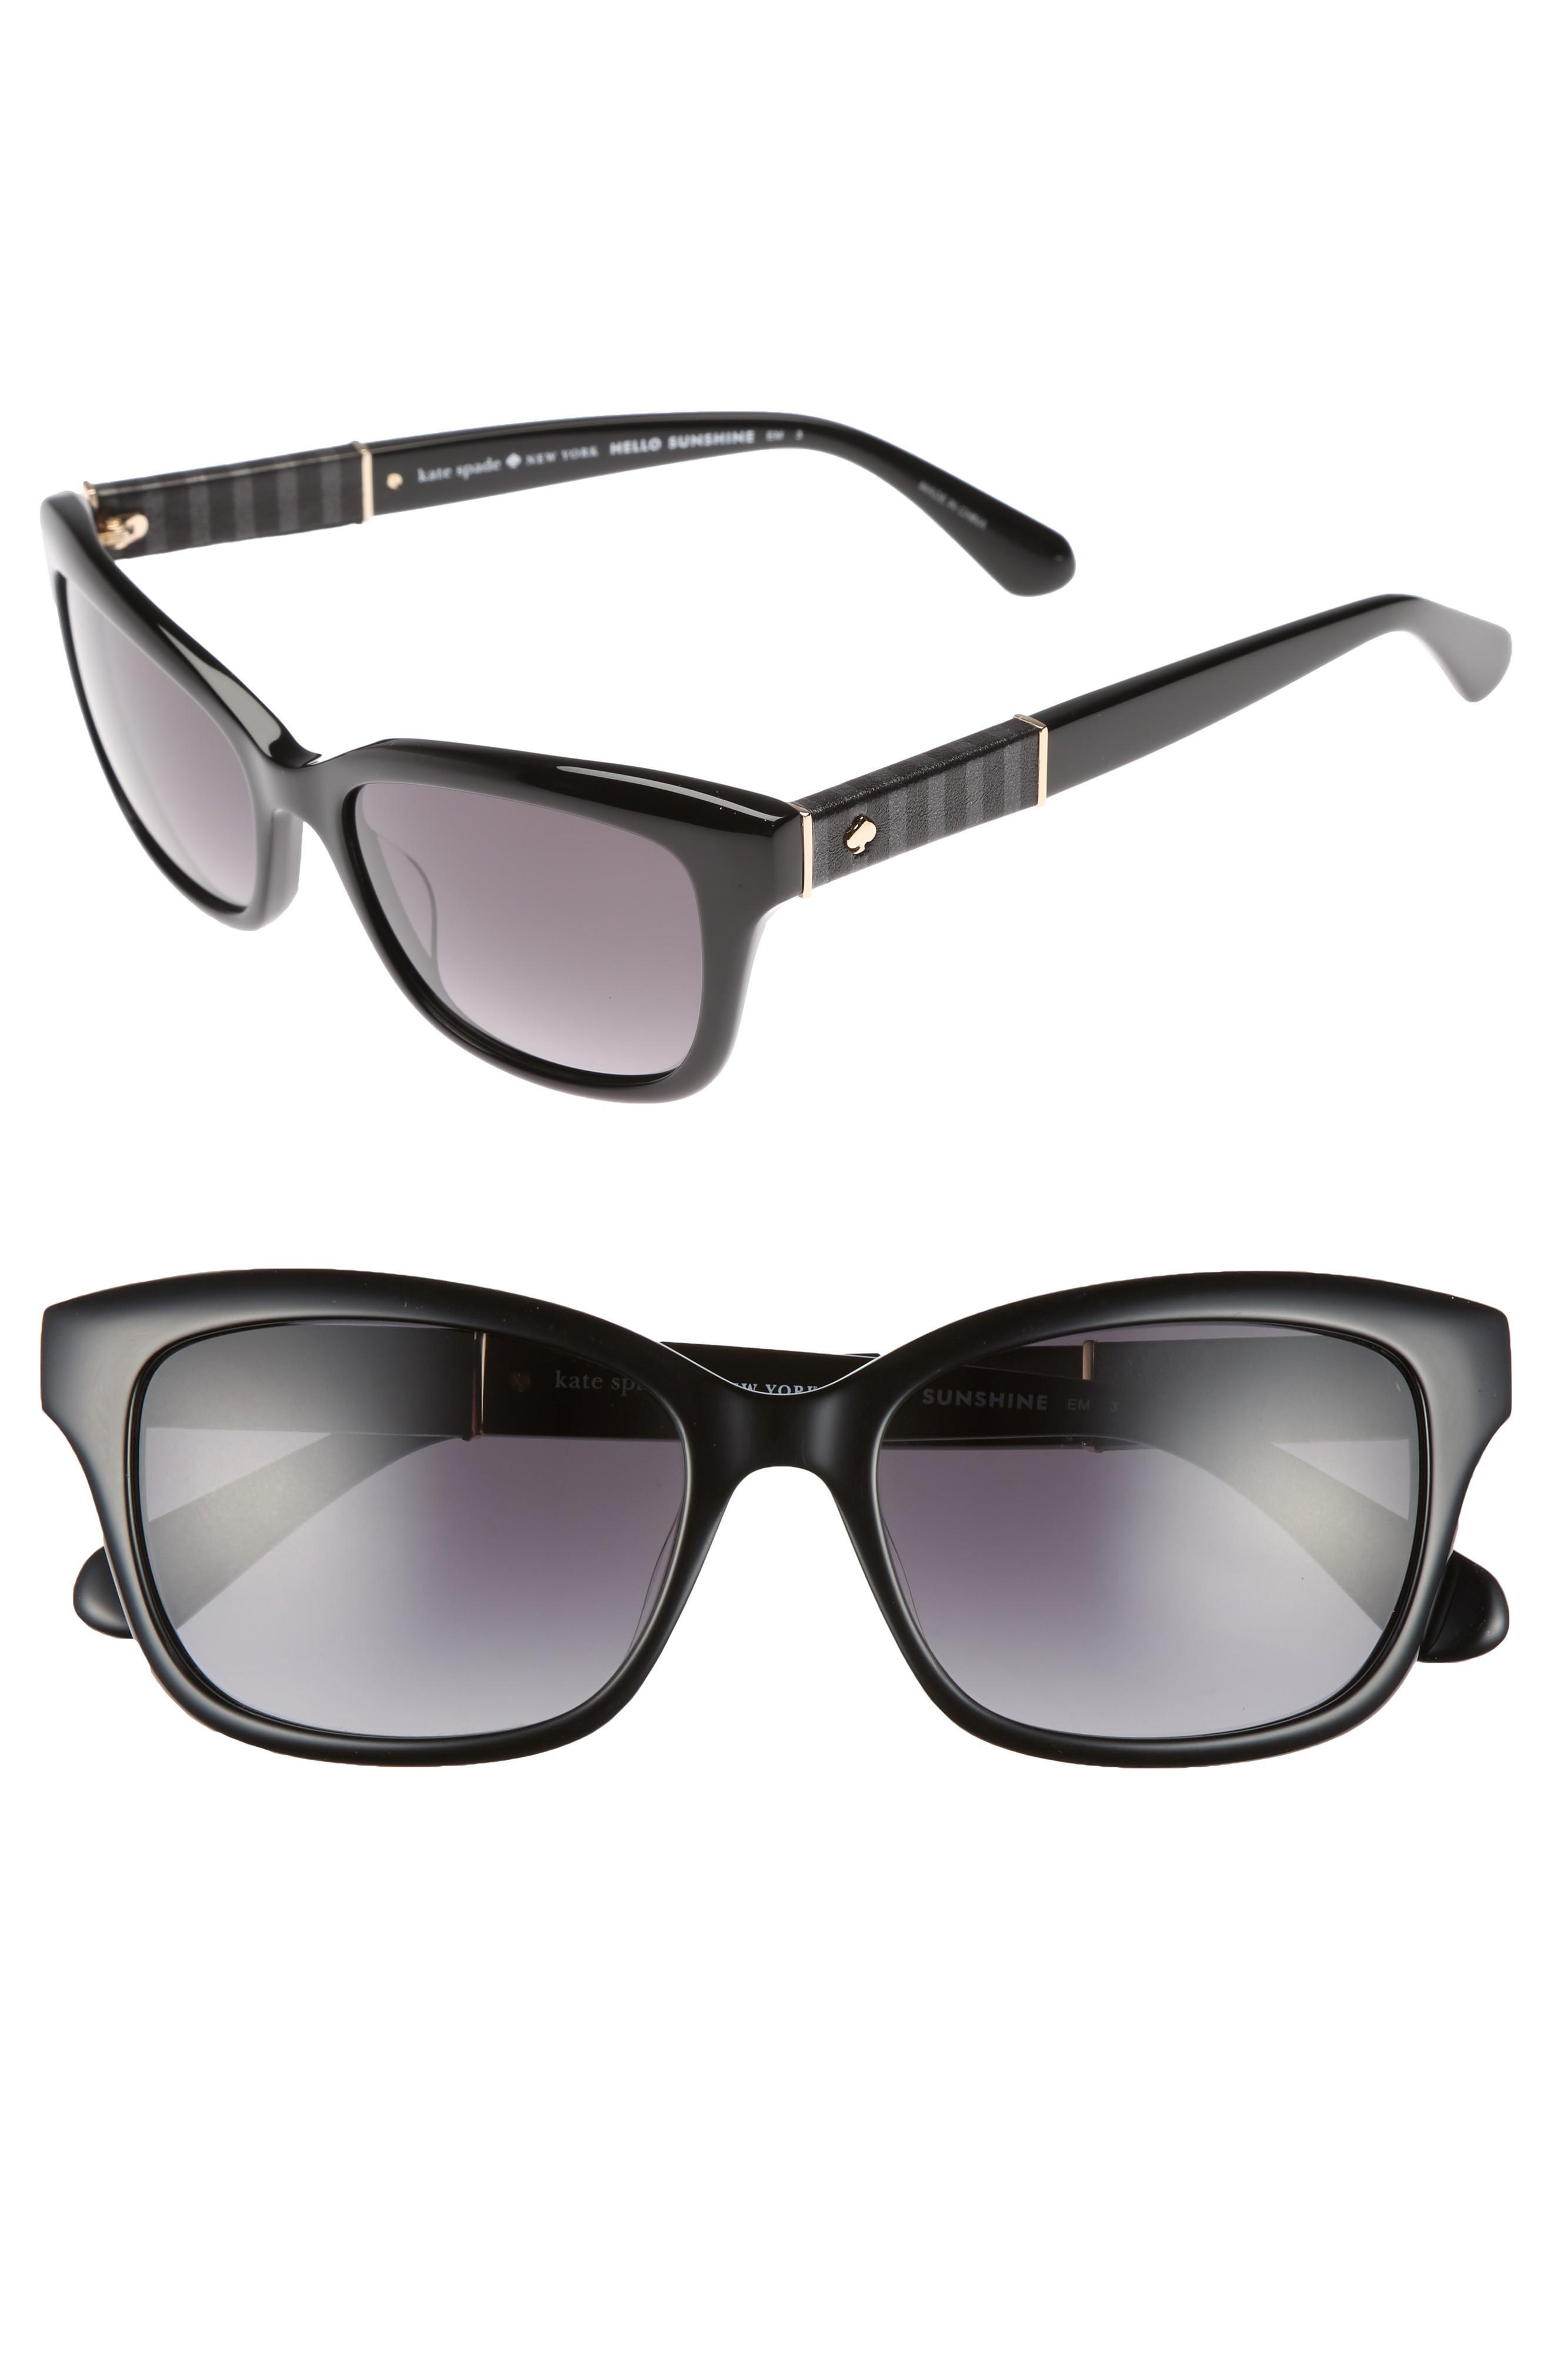 ff5be83d1cea Kate Spade Johanna 2 53Mm Gradient Sunglasses - Black In Nocolor ...